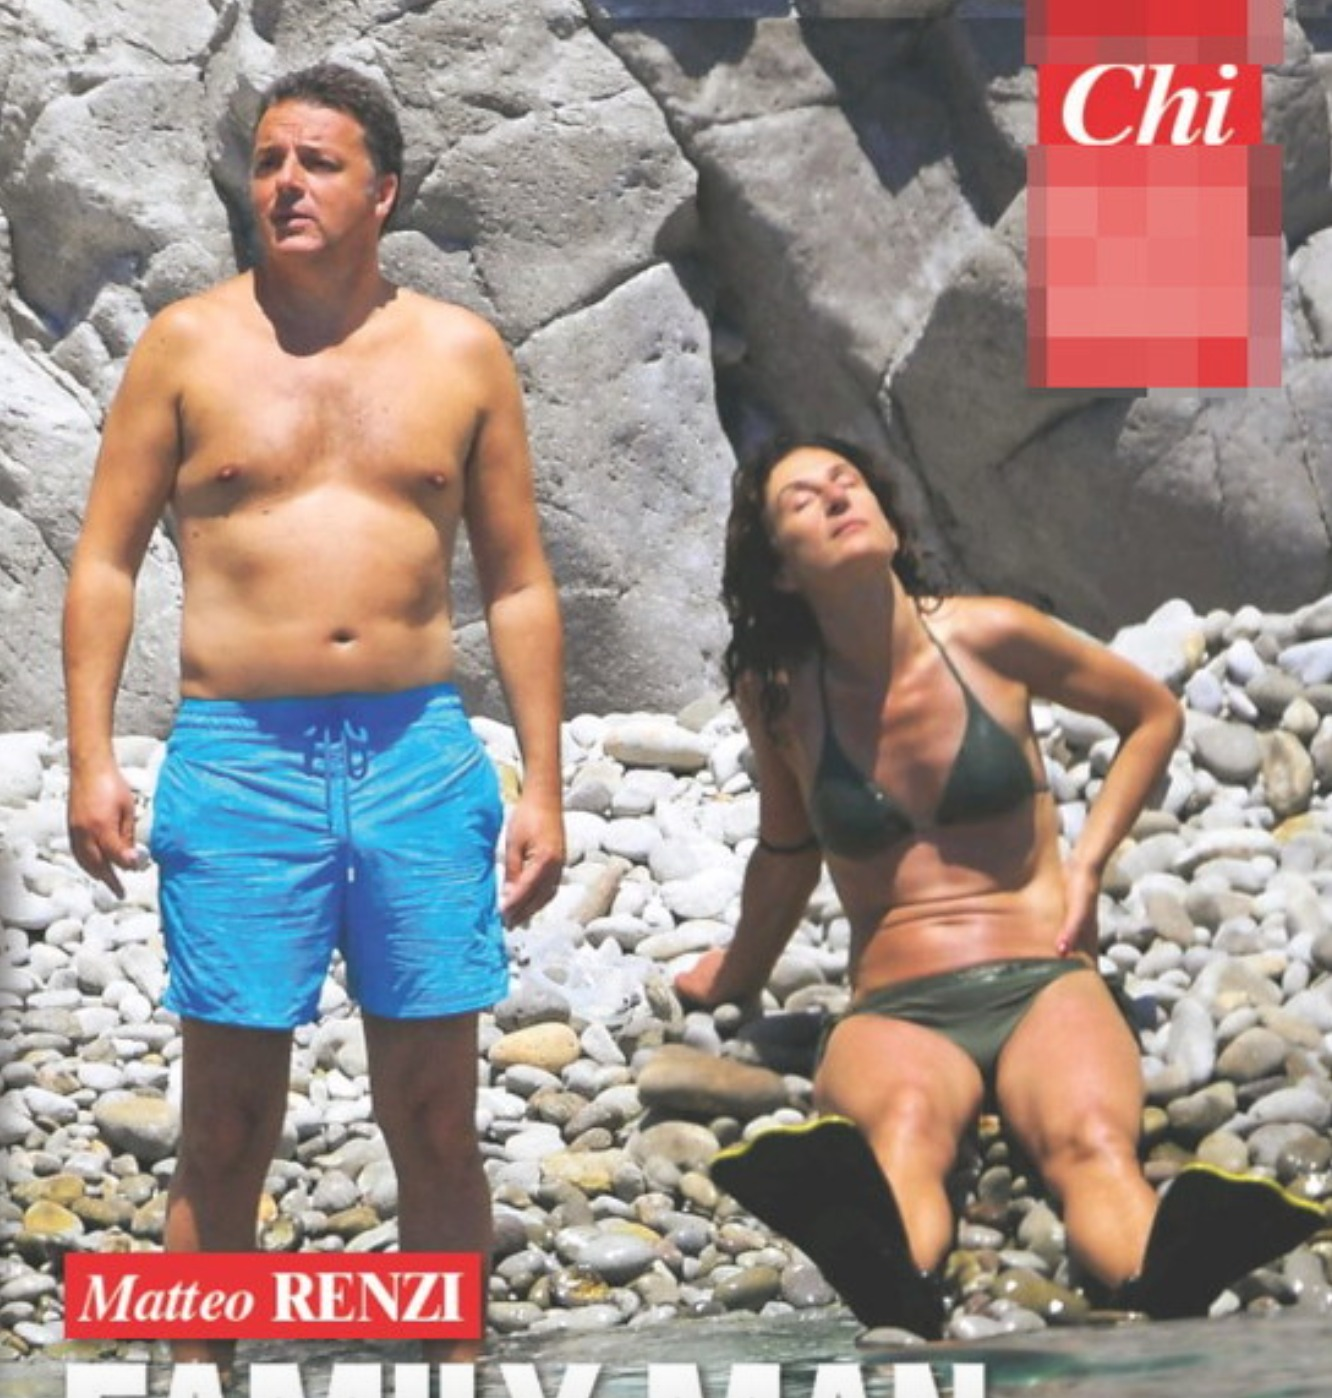 agnese landini moglie matteo renzi fisico bikini